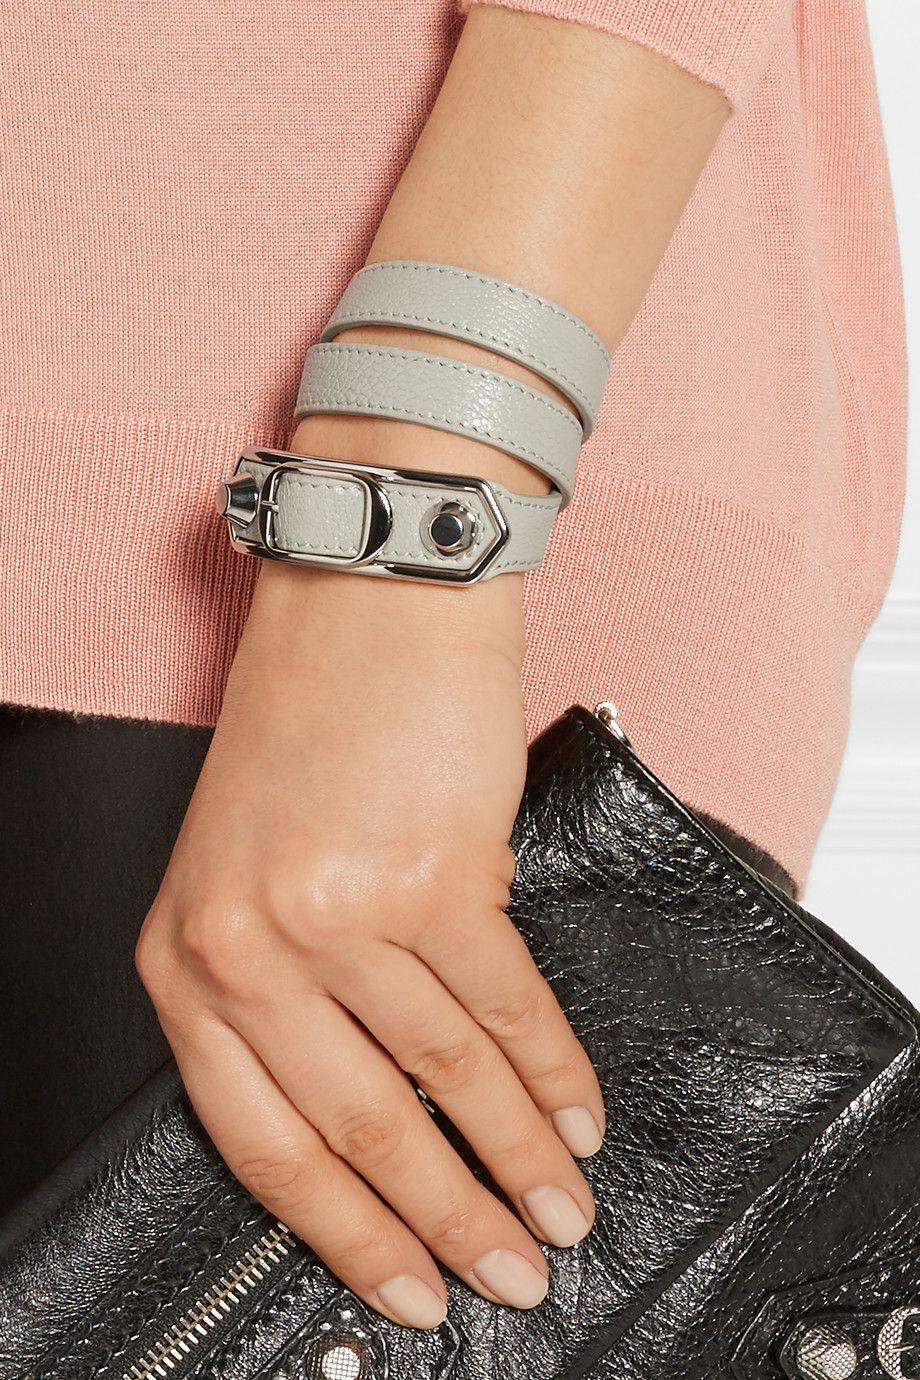 17ec4a4f1432b Balenciaga | Triple Tour textured-leather and silver-tone bracelet ...